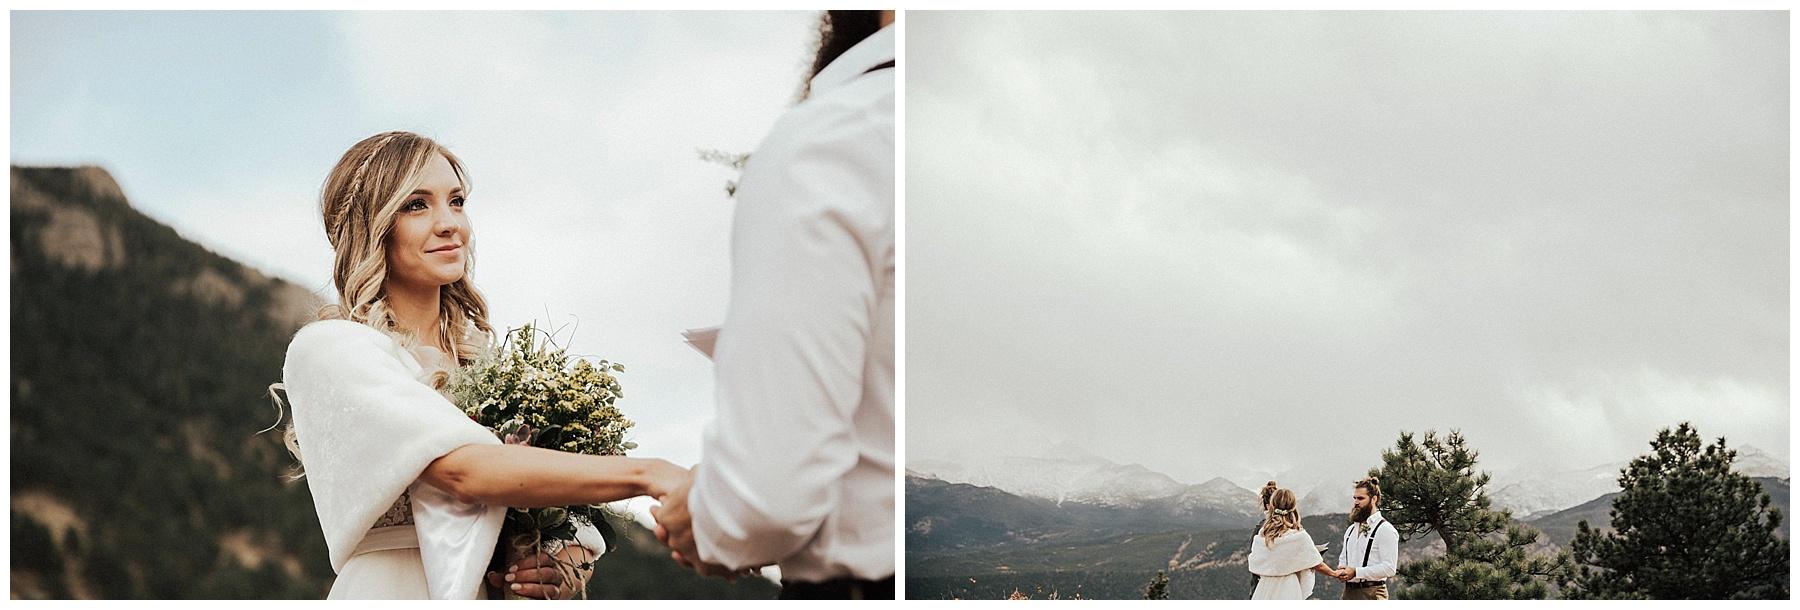 Colorado Destination Elopement Tampa Wedding Photographer-71-1.jpg